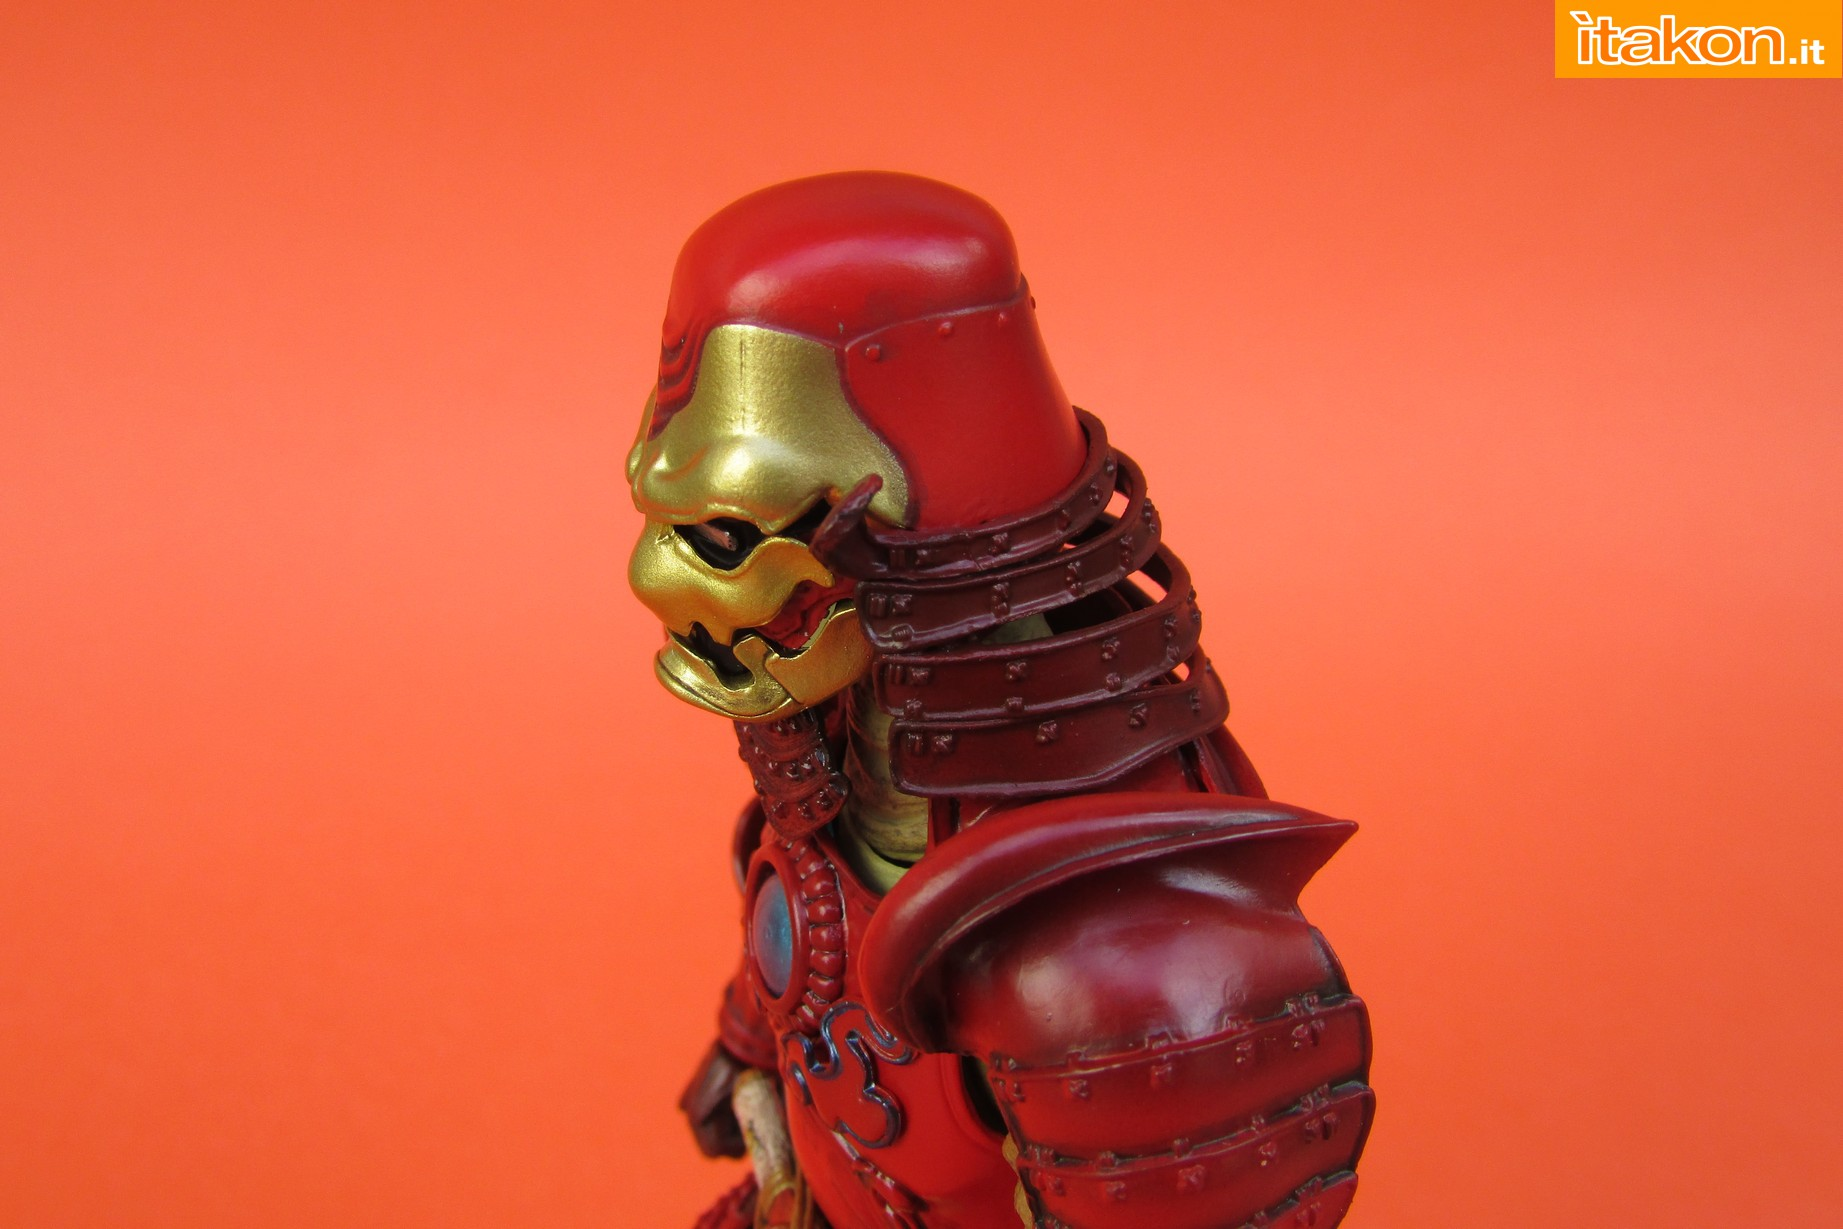 Link a Marvel Comics Koutetsu Samurai Iron Man Mark 3 Meishou MANGA REALIZATION review Bandai Itakon.it28